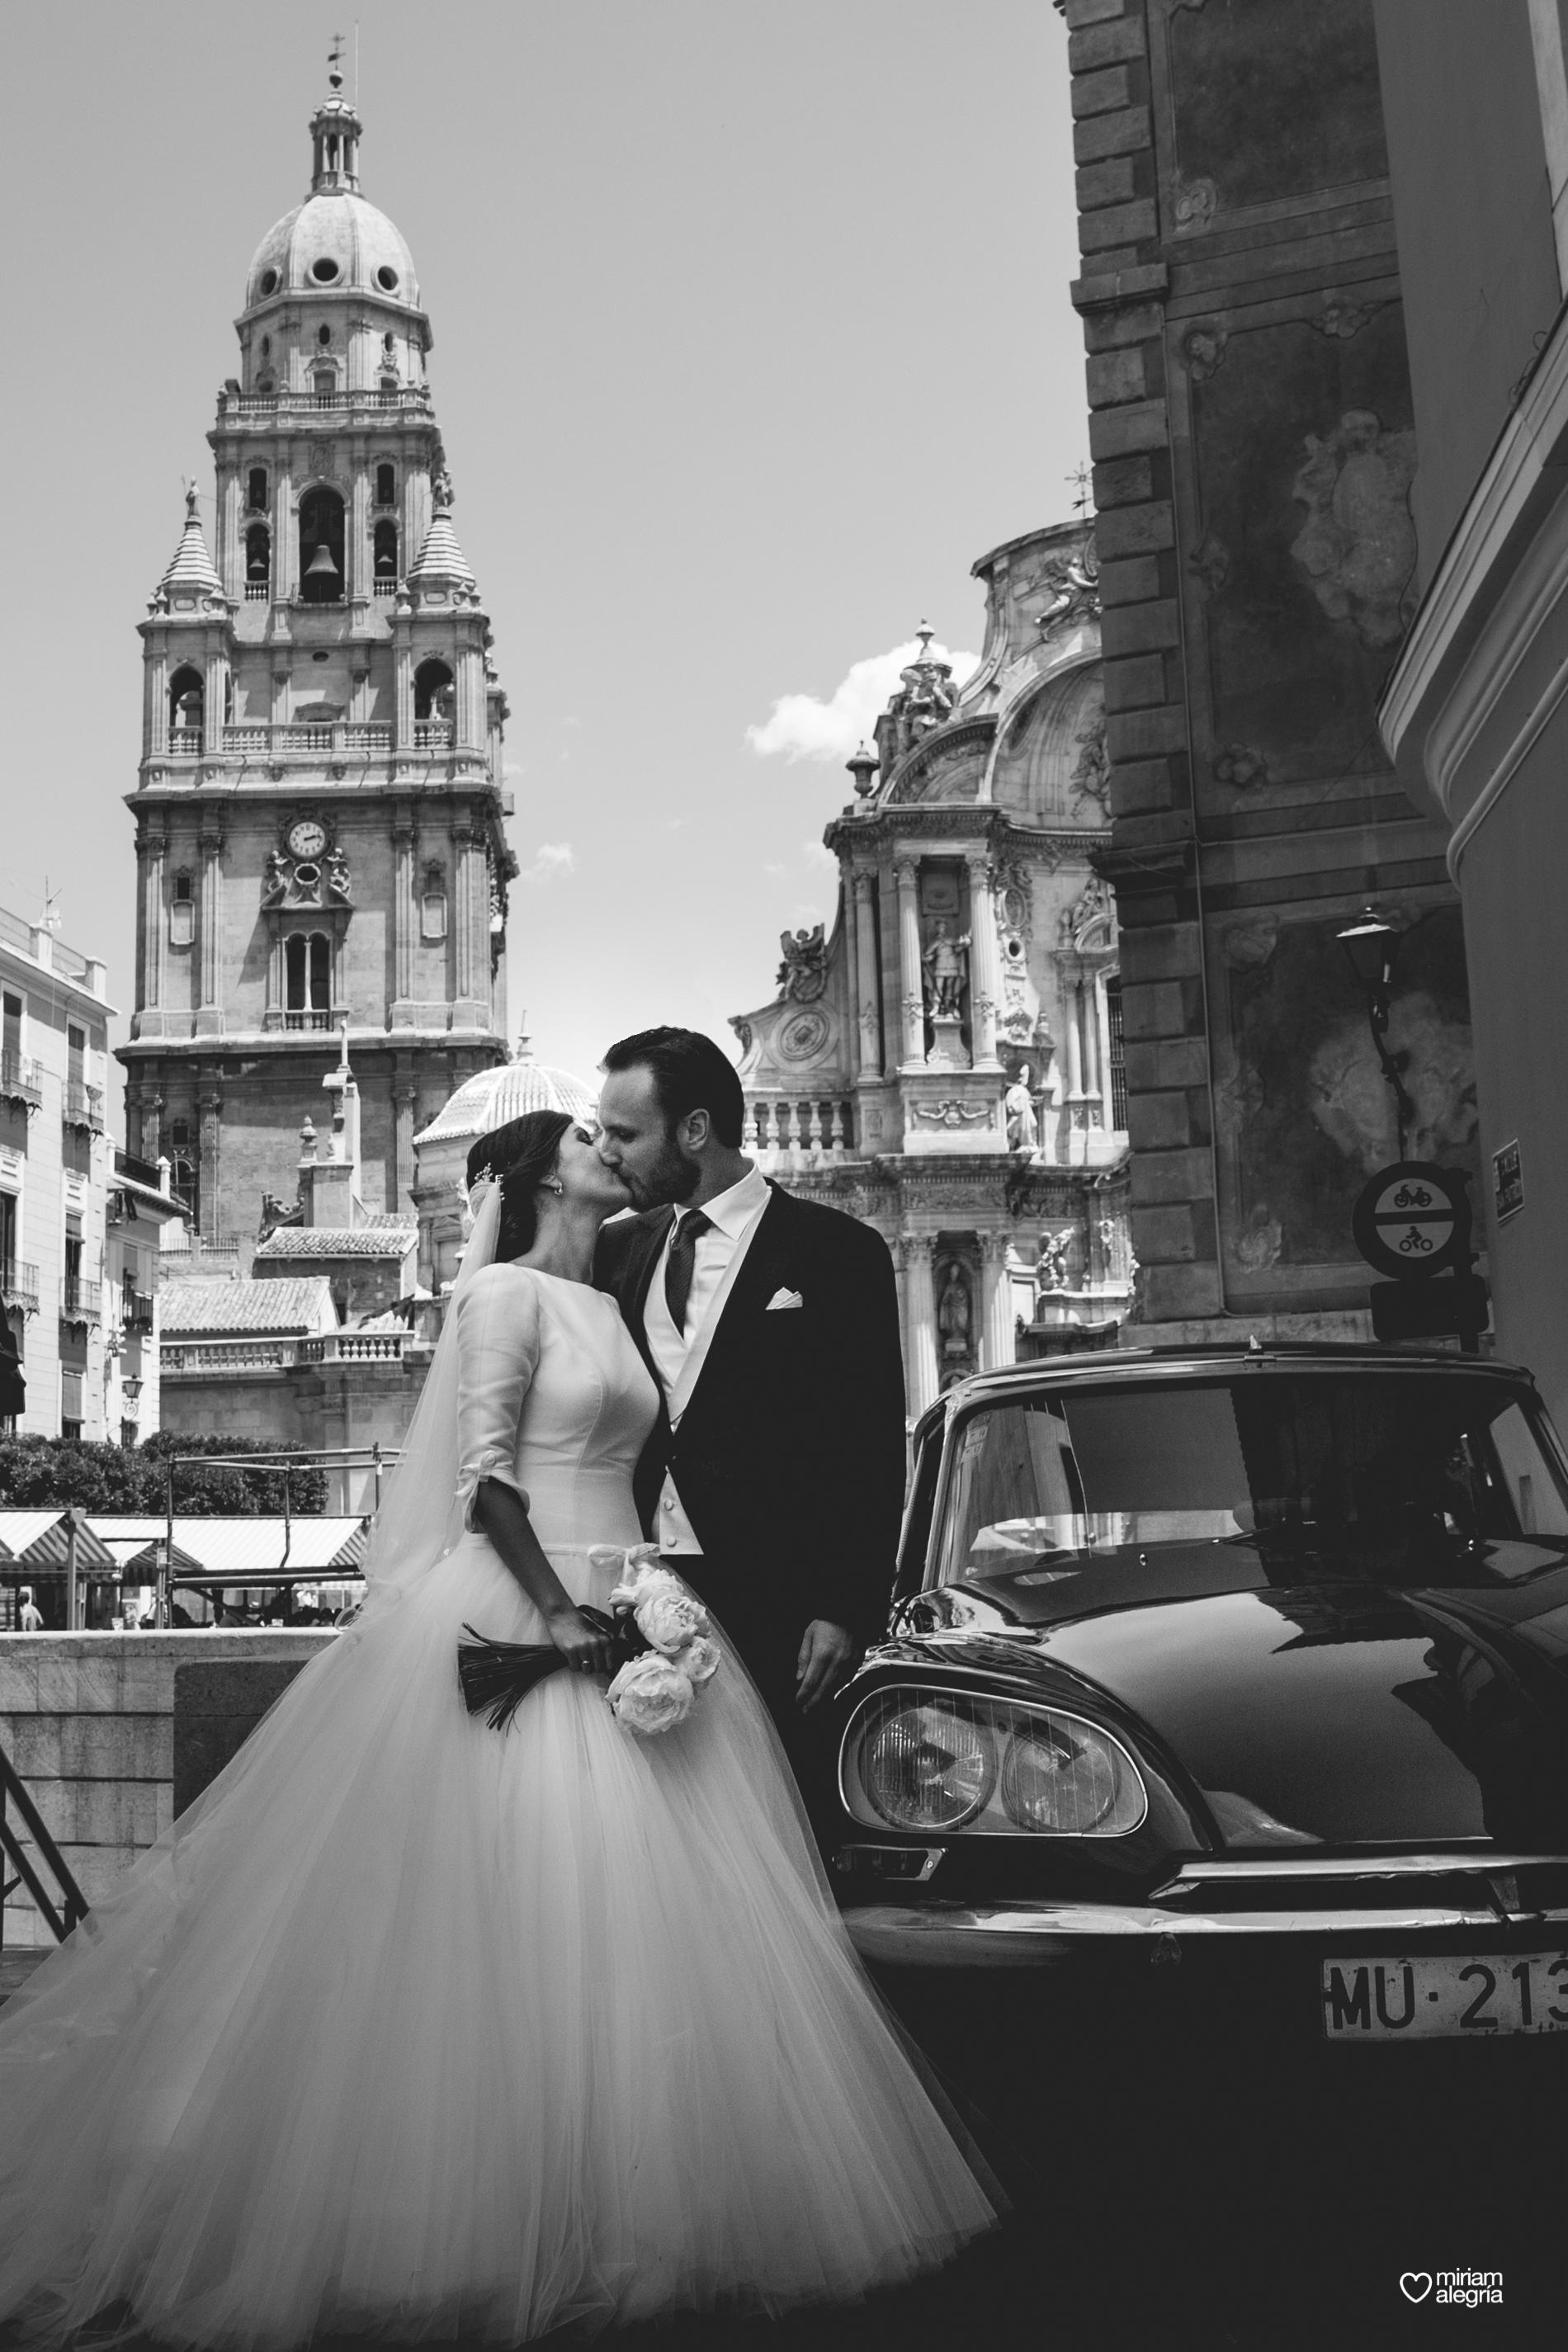 boda-en-la-catedral-de-murcia-miriam-alegria-fotografos-boda-murcia-60